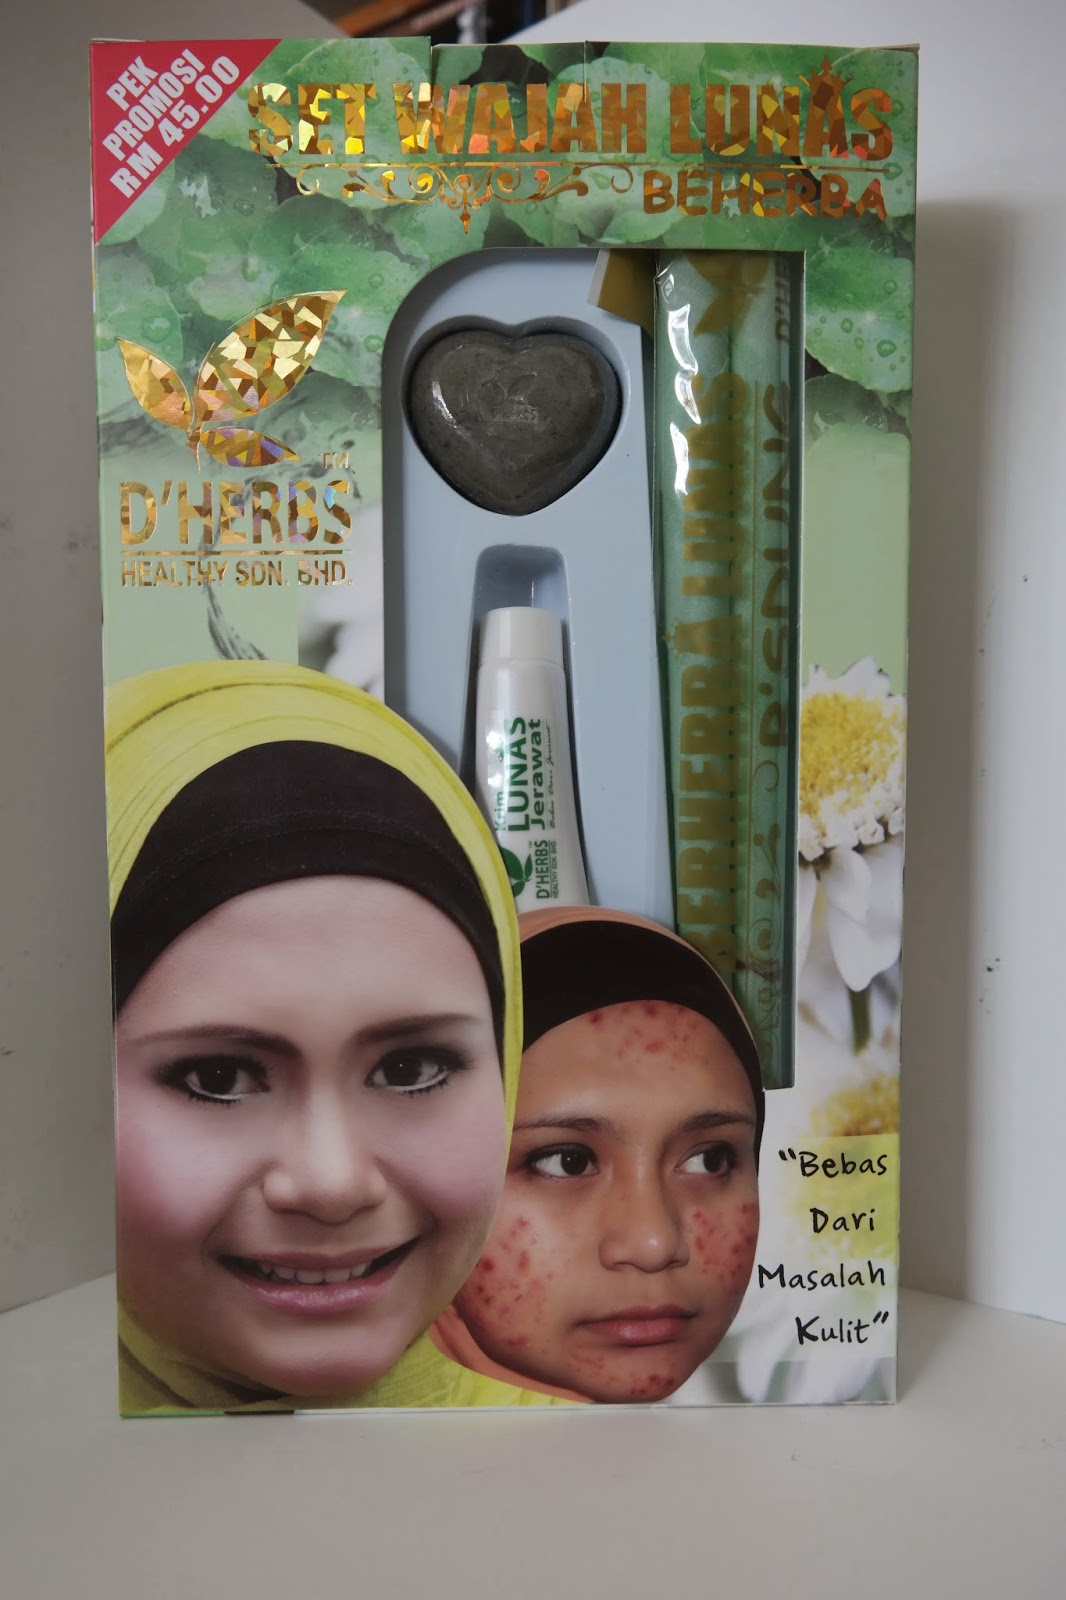 Lynz Beauty Care D39HERBS KOSMETIK Amp KECANTIKAN